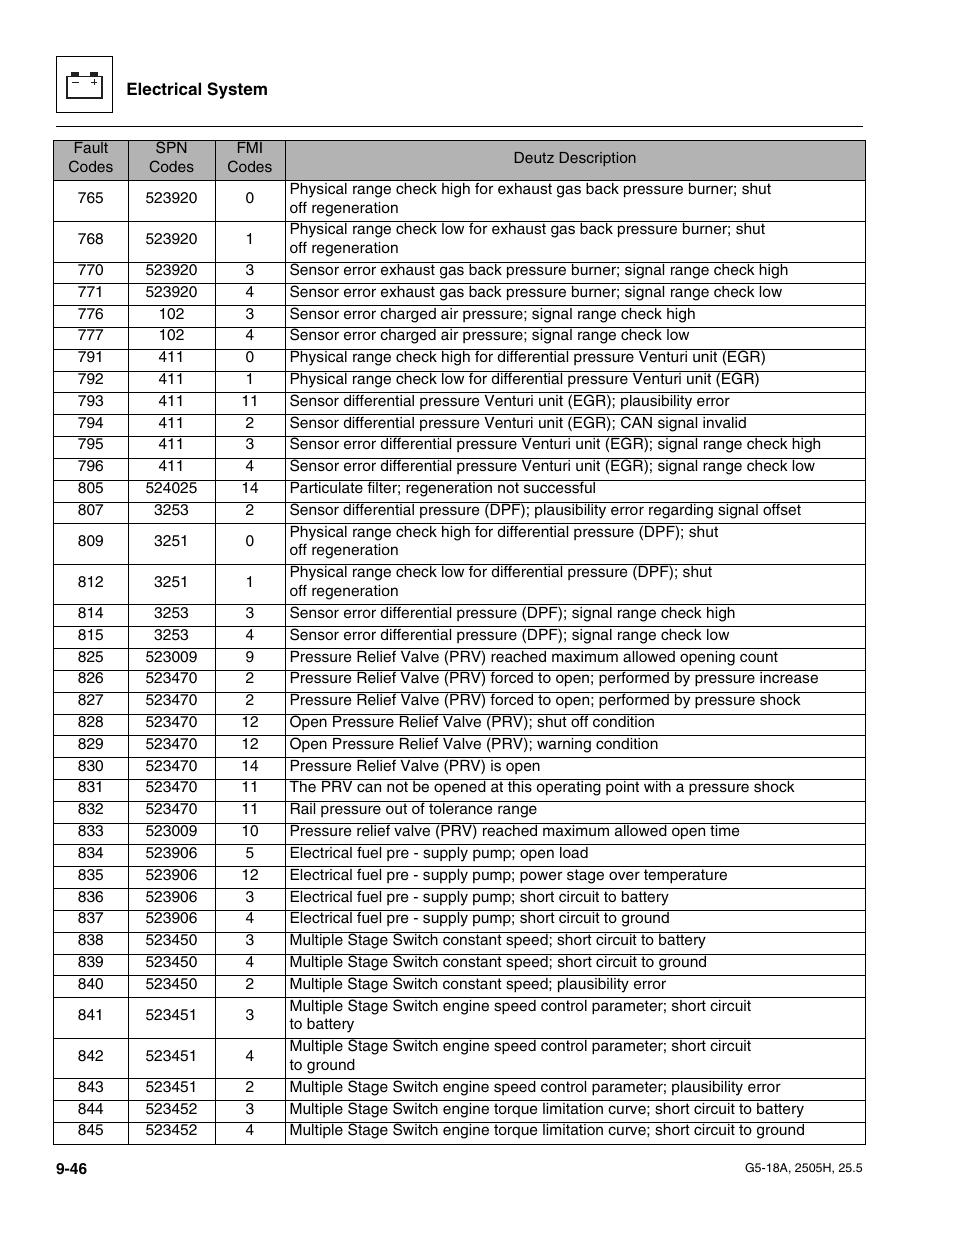 deutz emr2 wiring diagram 2000 pontiac grand prix starter manual code erreur books